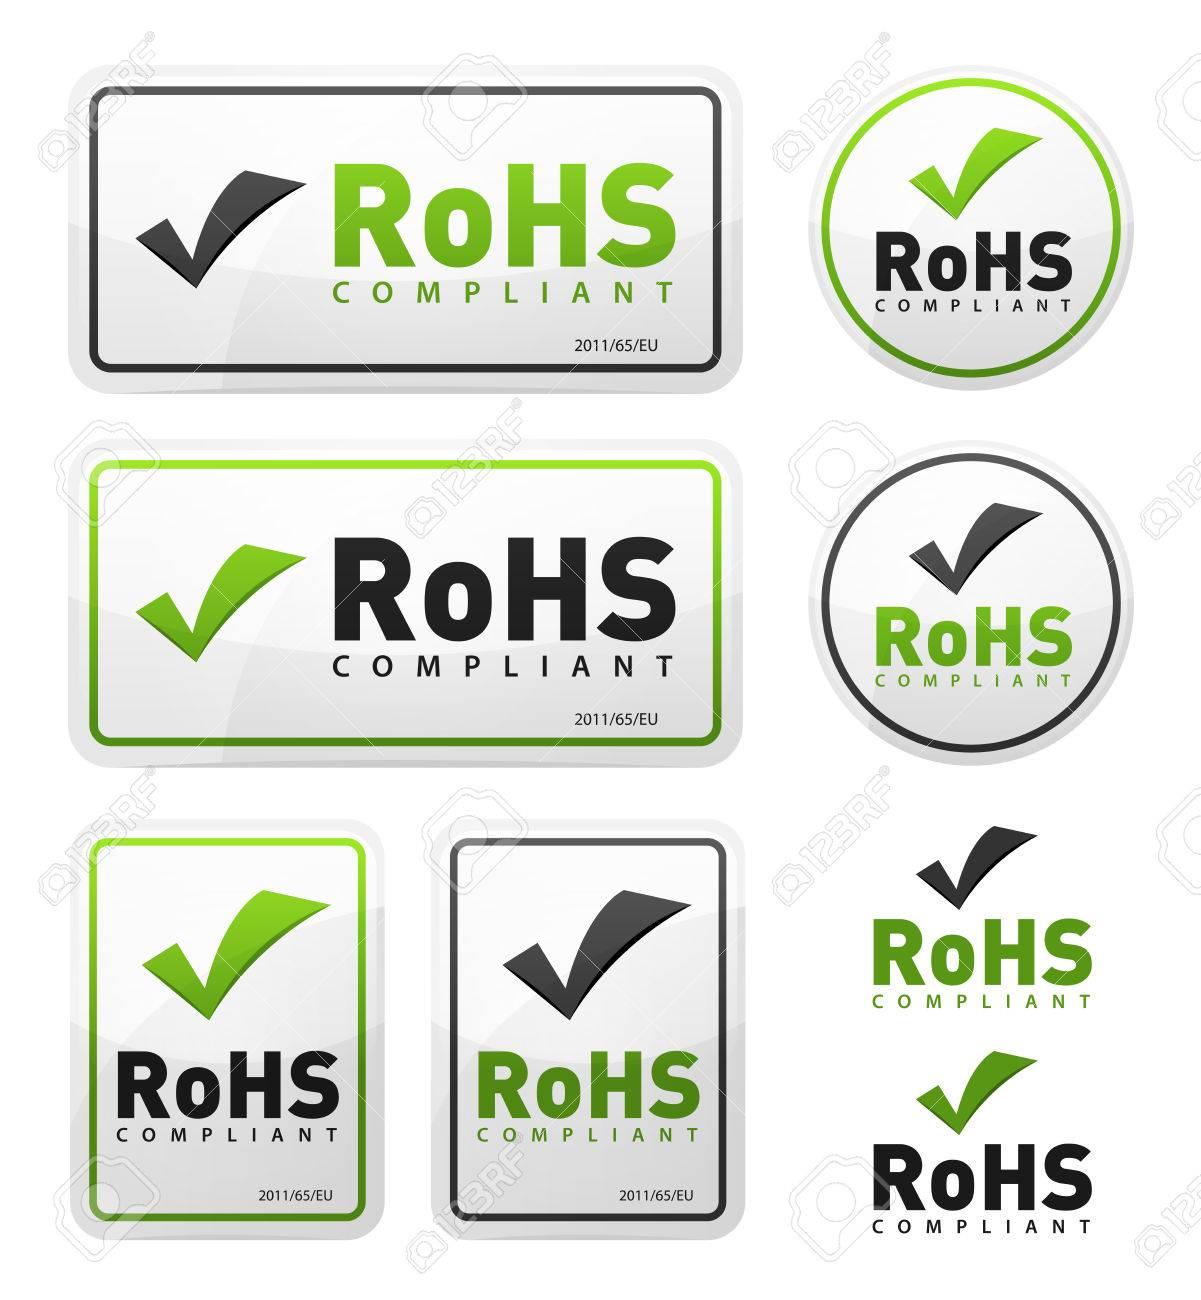 Illustration of a set of rohs compliant certificate signs, illustrating european union directive on hazardous substances - 79659006